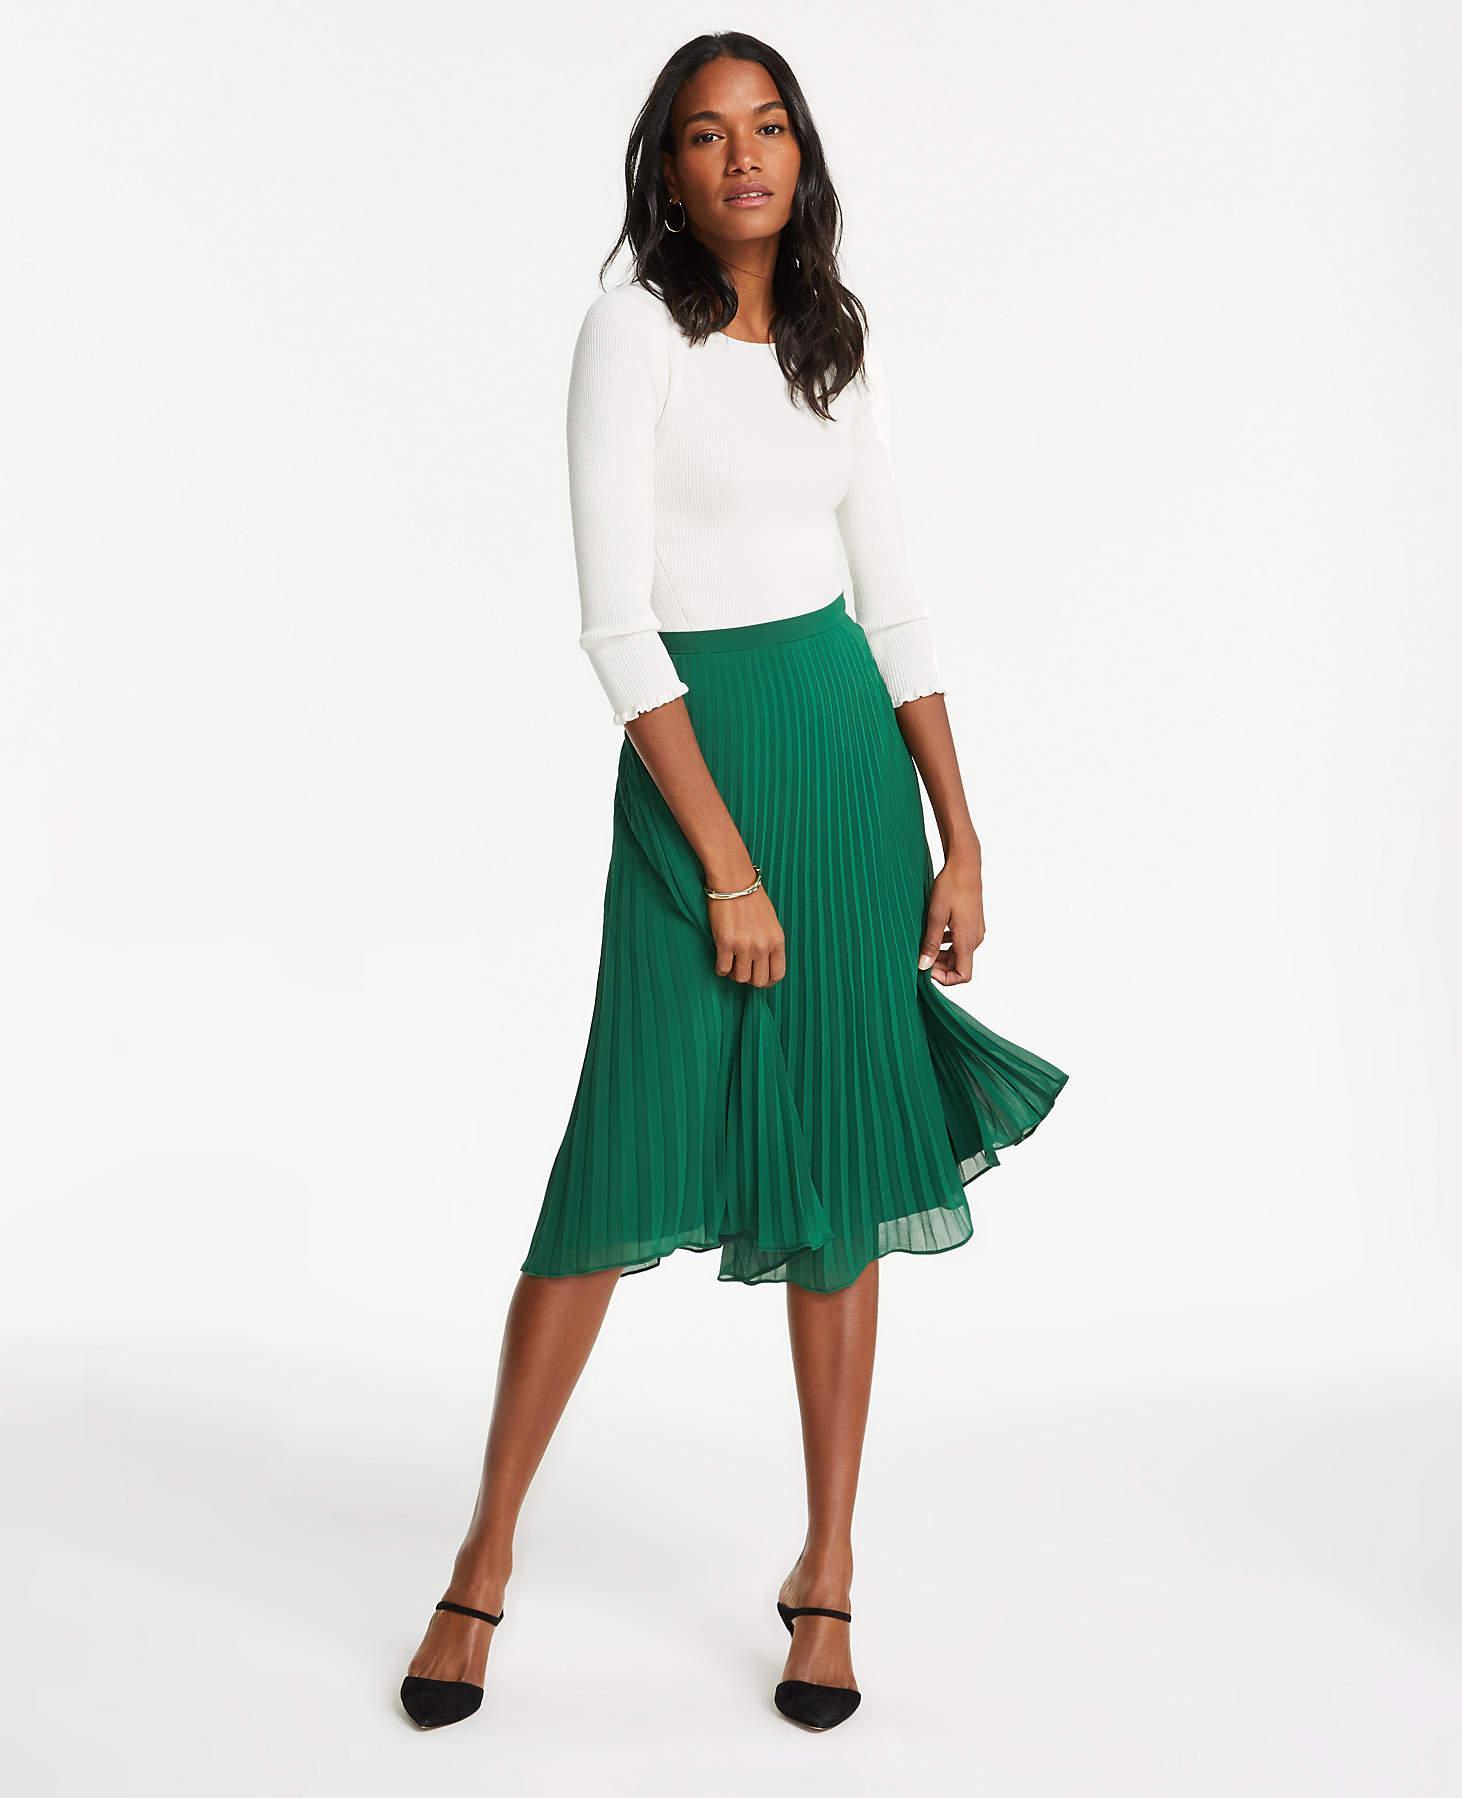 c4bcb956fe5d Ann Taylor Petite Pleated Skirt in Green - Lyst